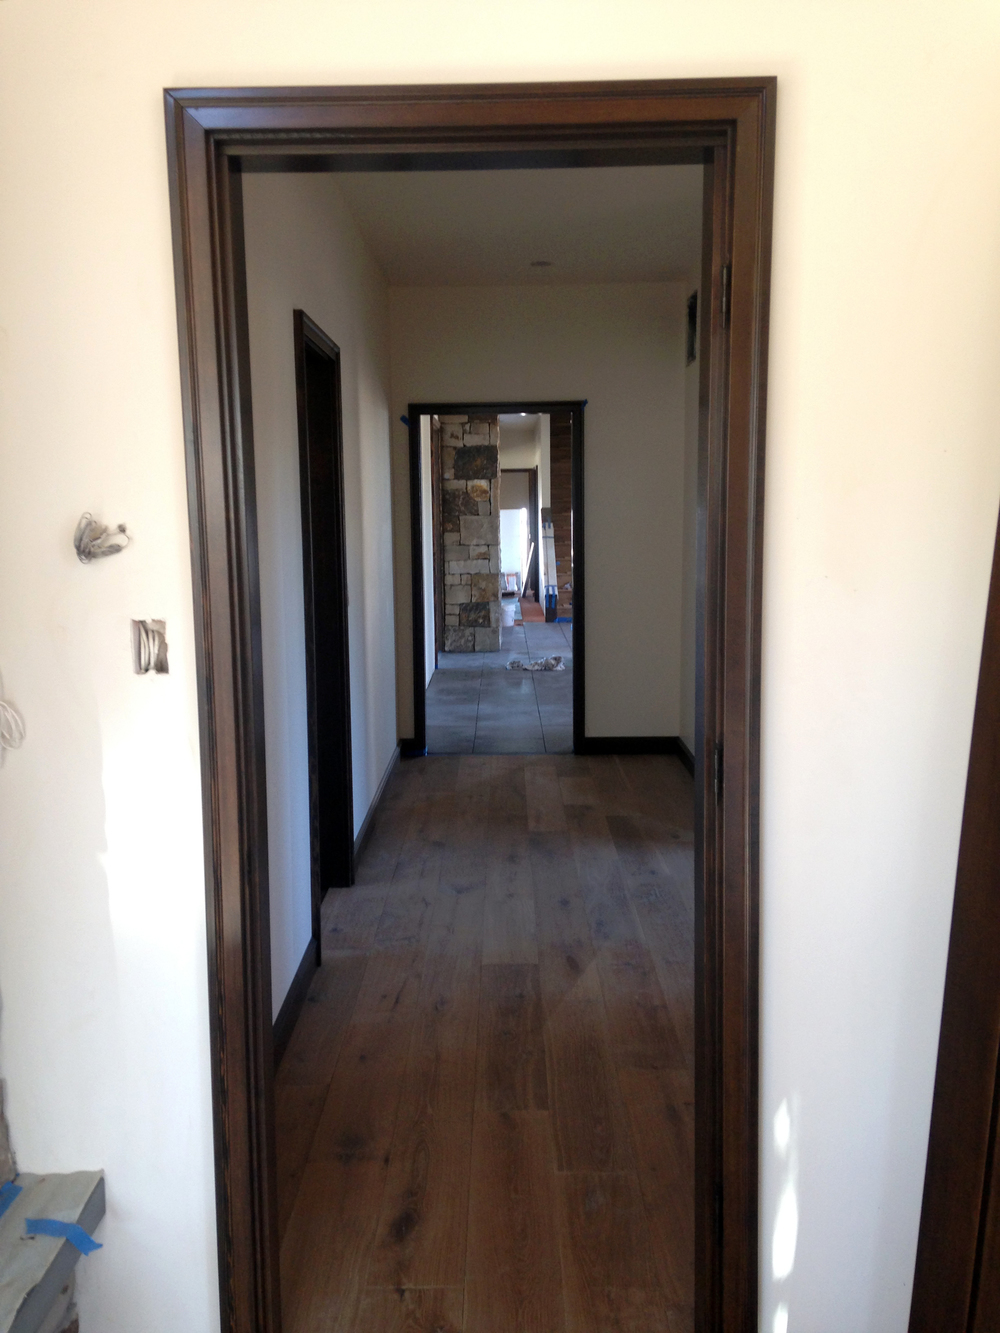 drw deschutes residence interior hallway fireplace.JPG